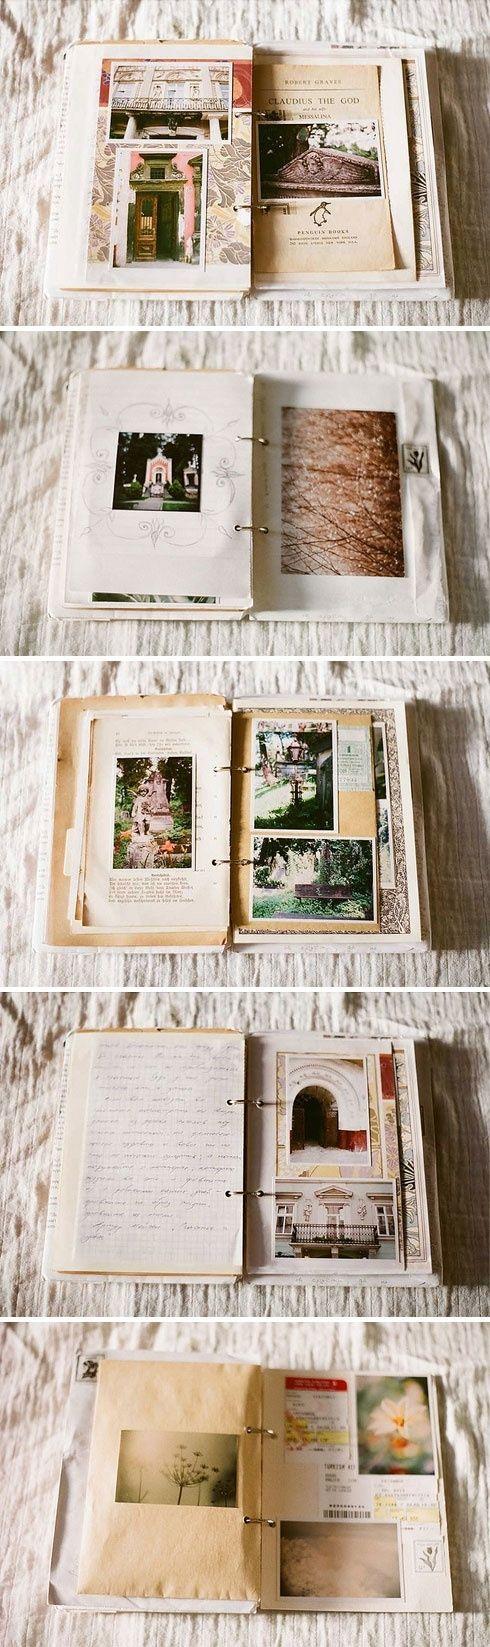 Travel journal by Marsha Santos